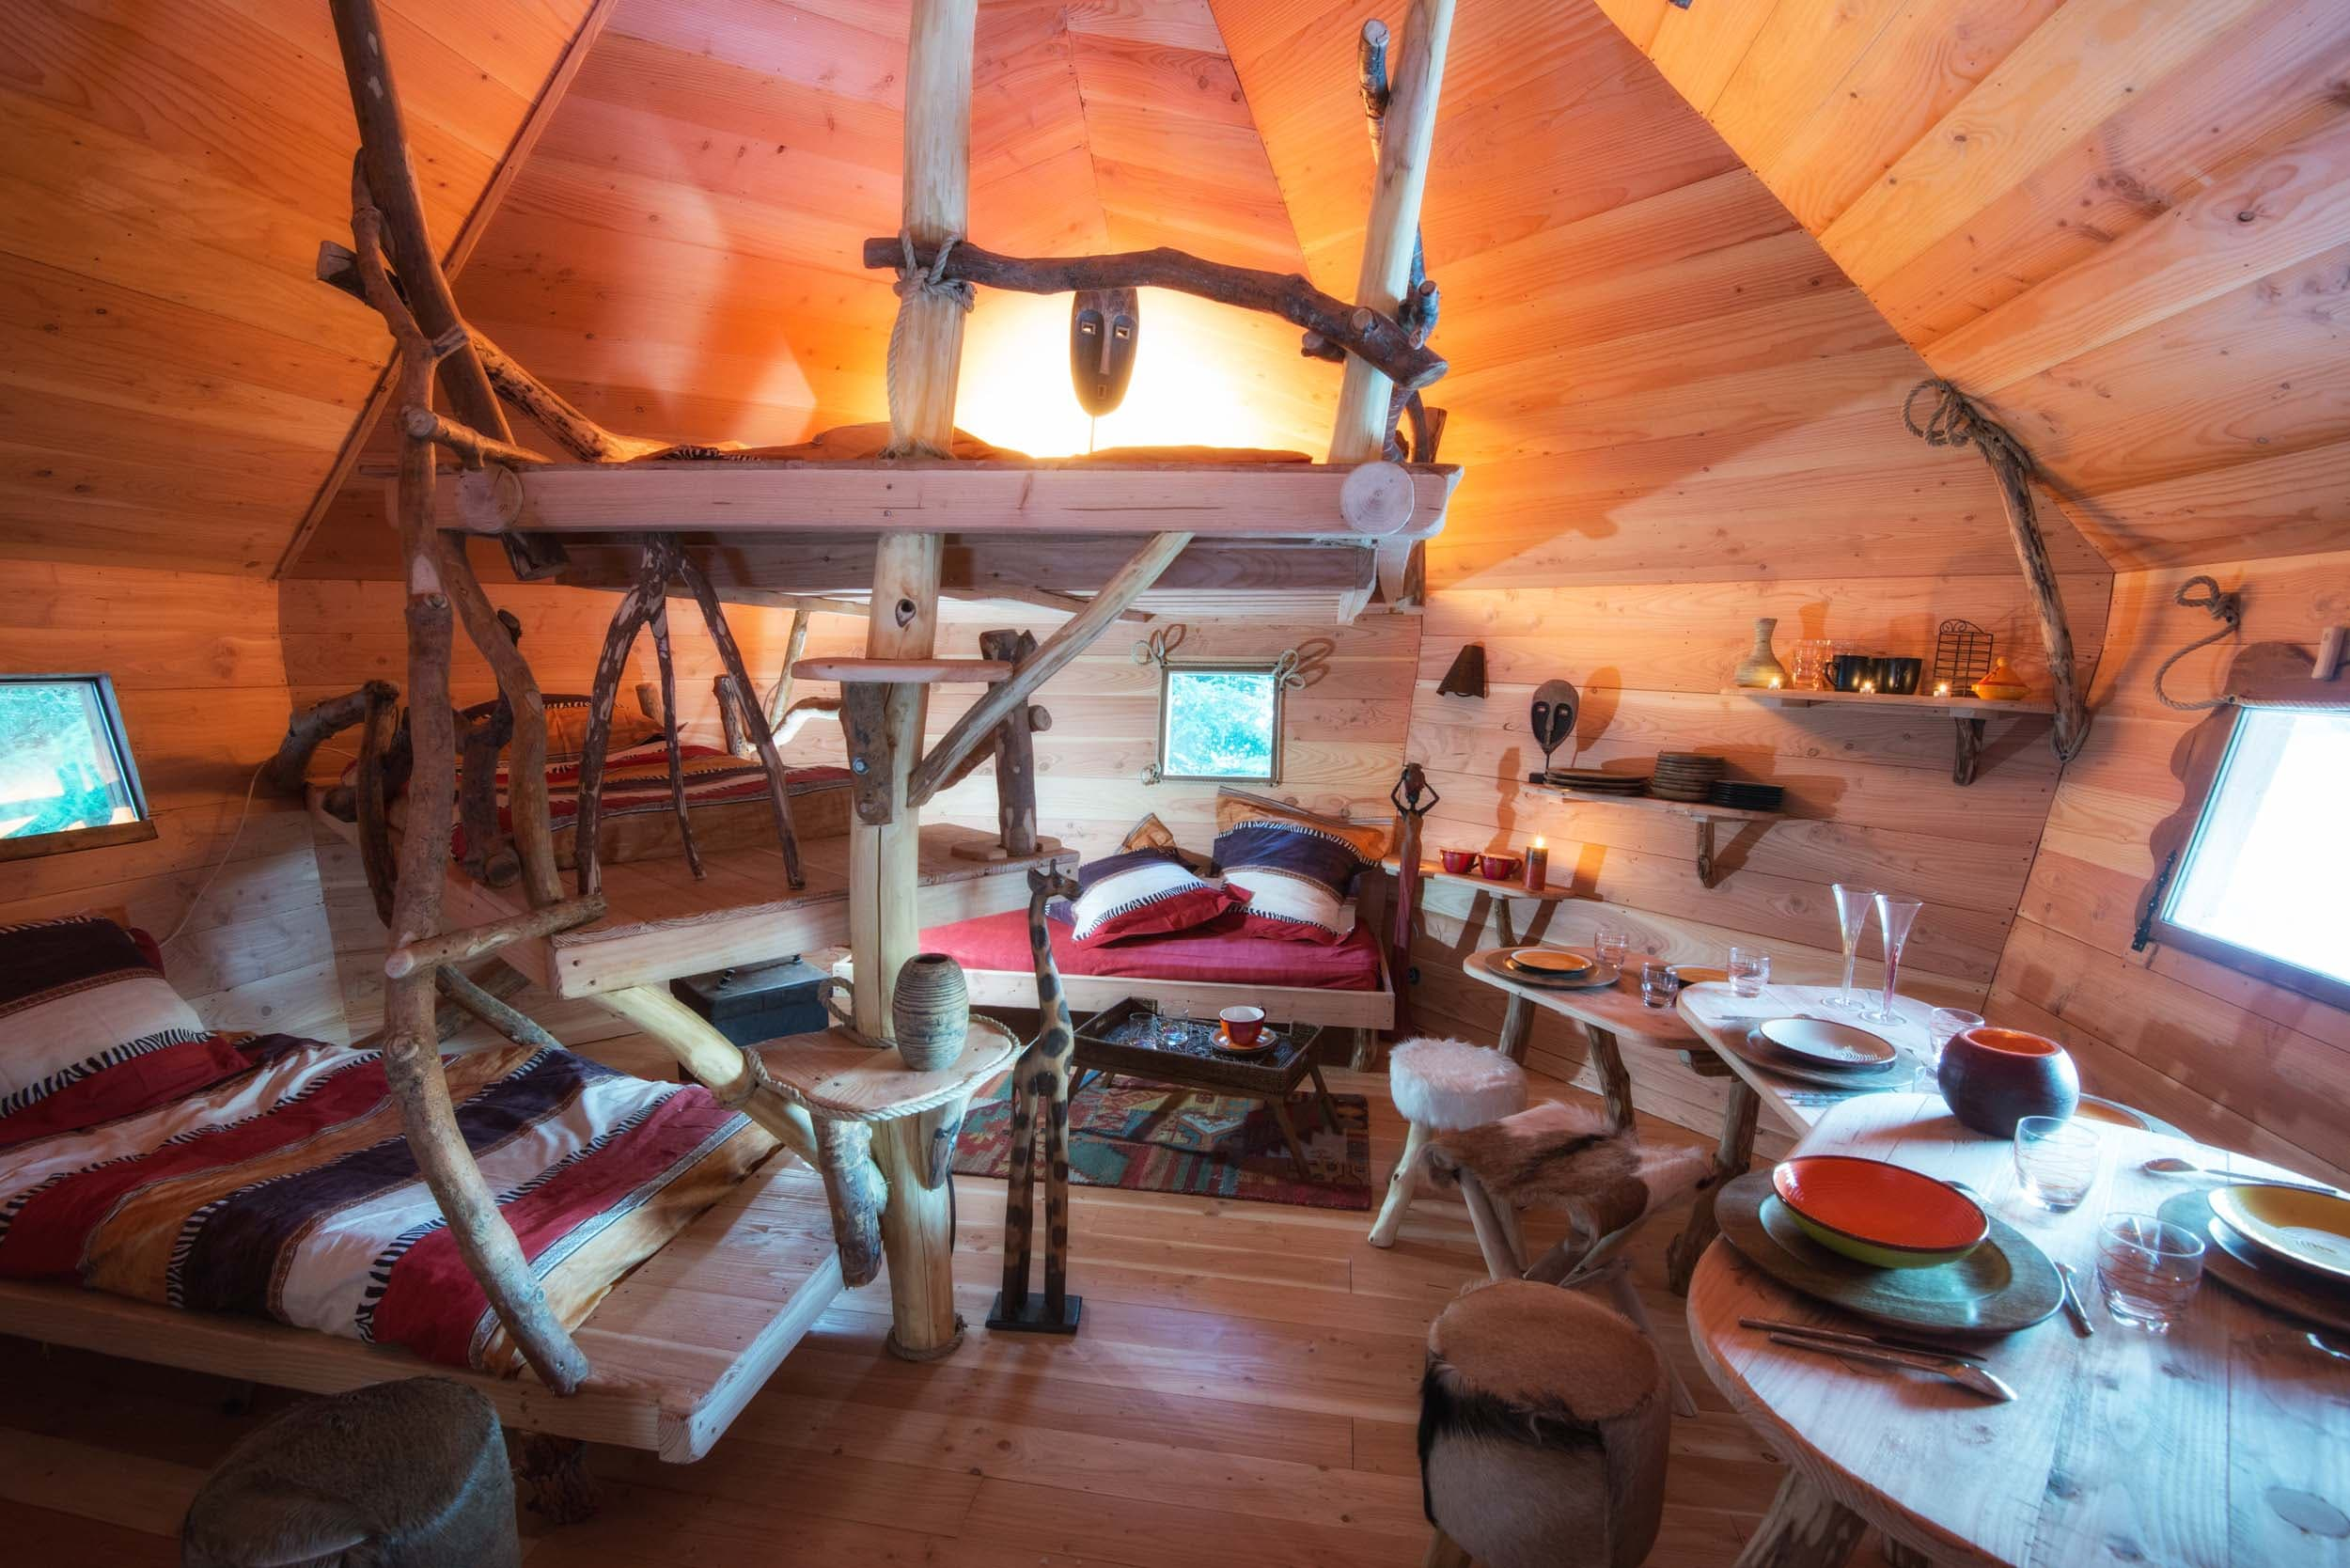 maison dans les arbres jura suisse avie home. Black Bedroom Furniture Sets. Home Design Ideas